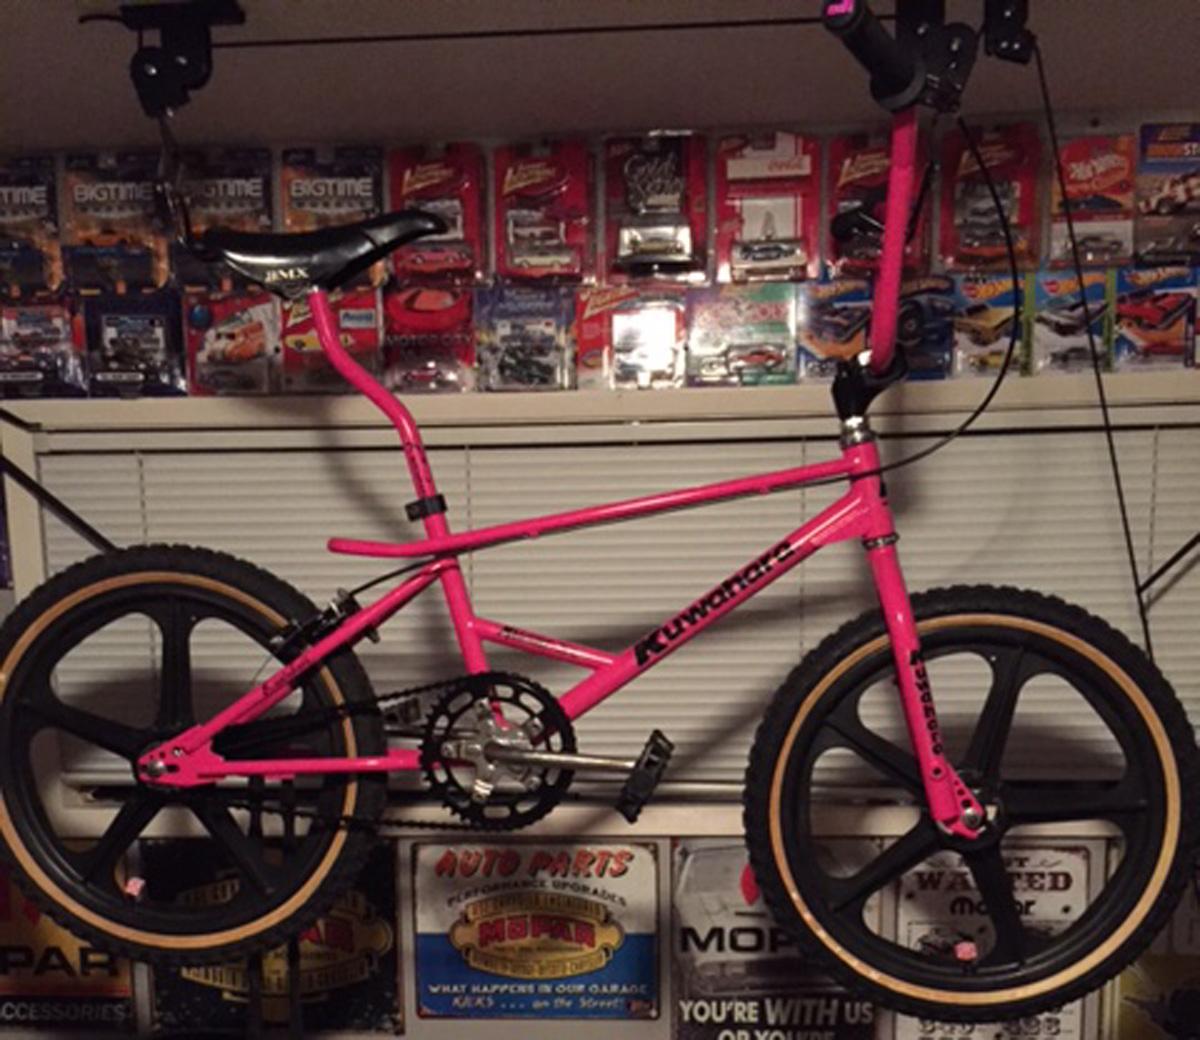 Tnt Pro Rare Restoration Decals Bmx Rider